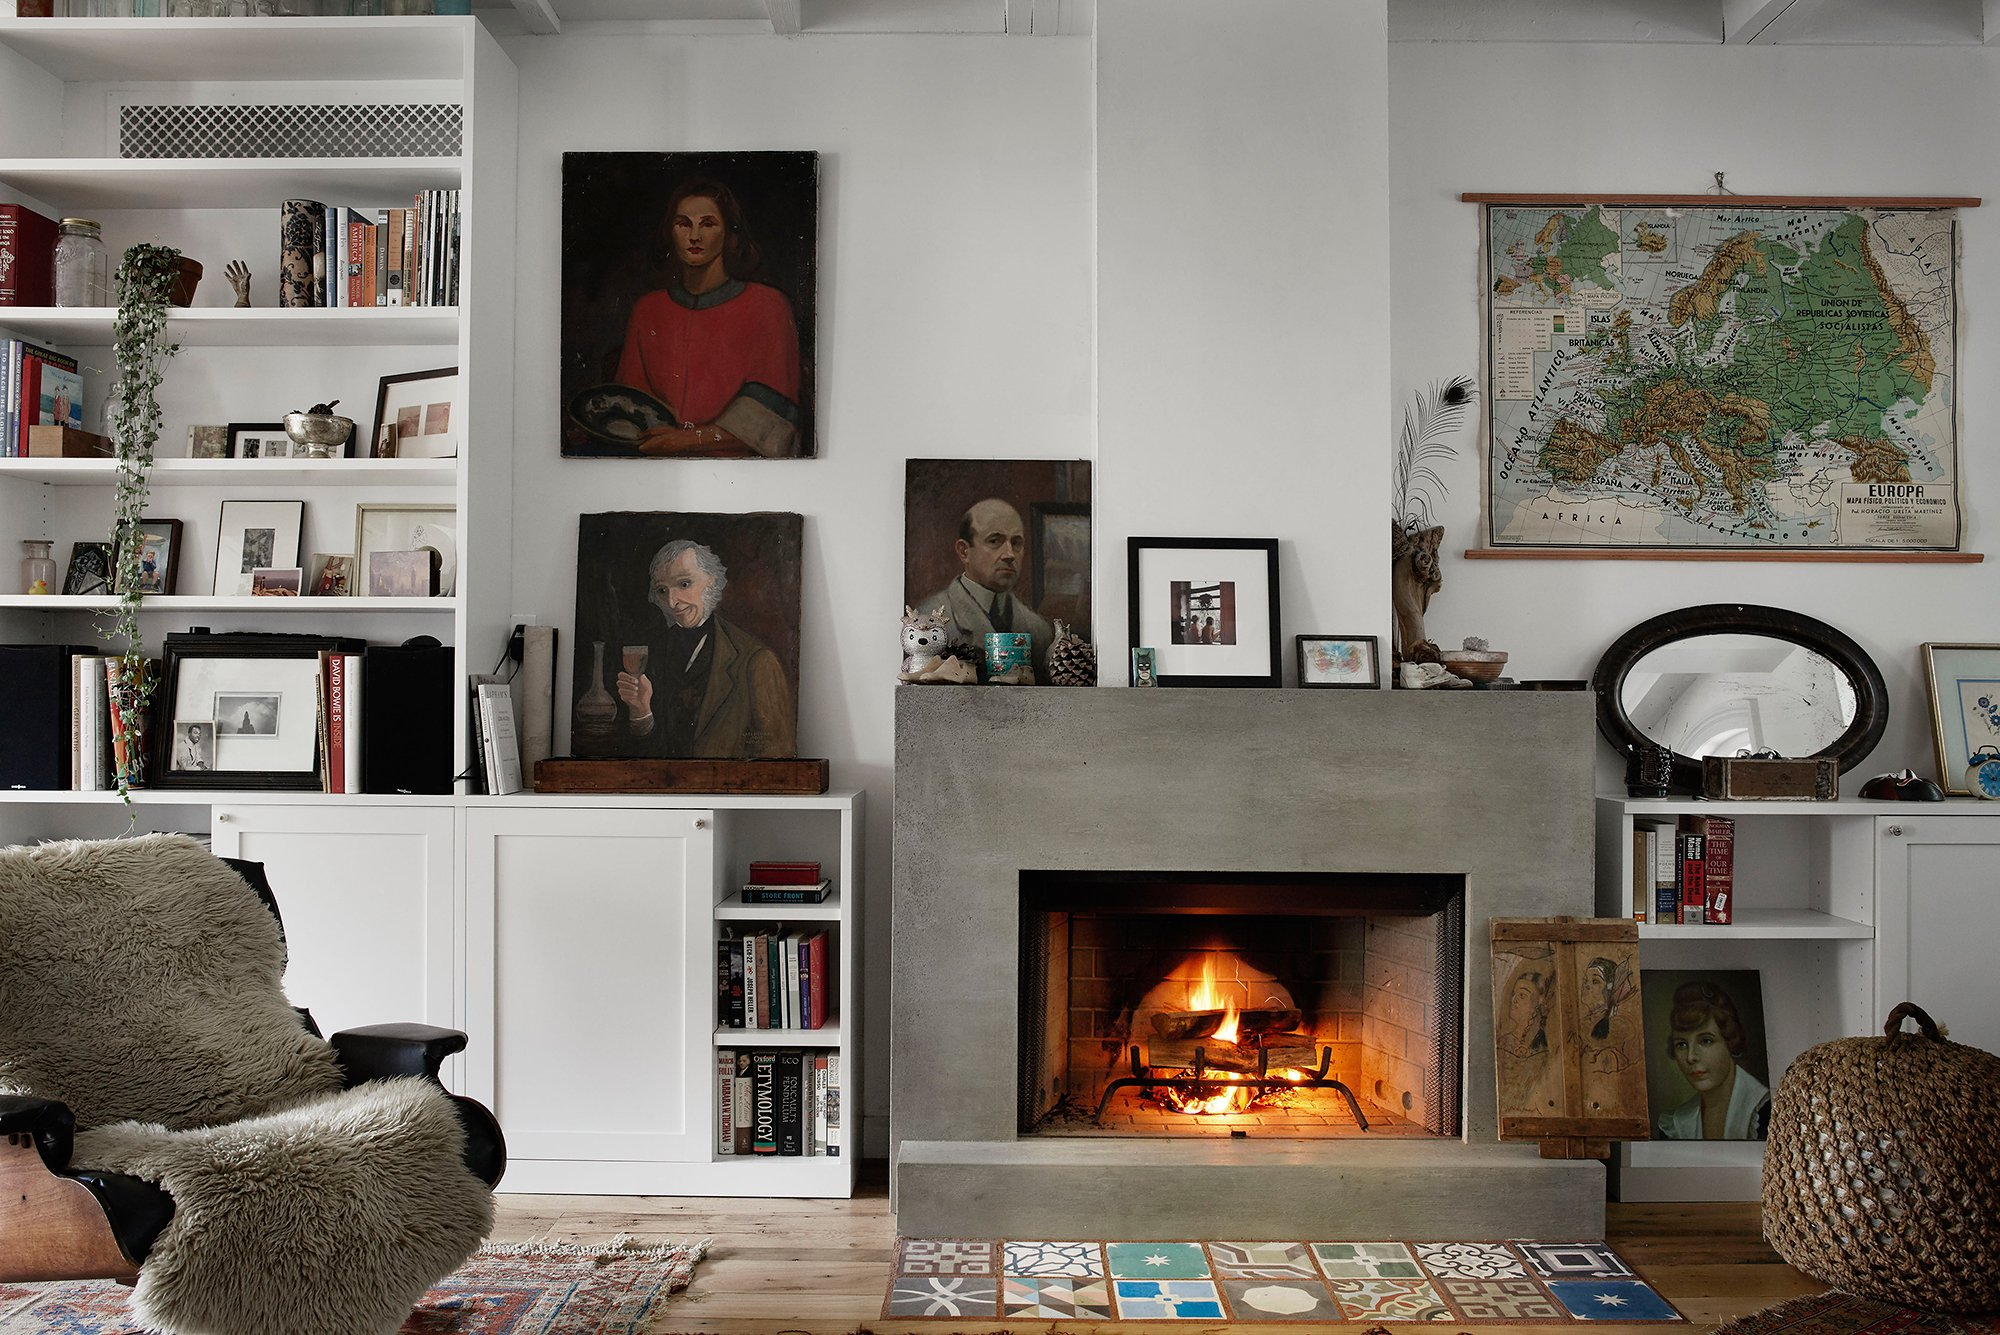 concrete-fireplace-surround-tiles-rony-vardi-vogue